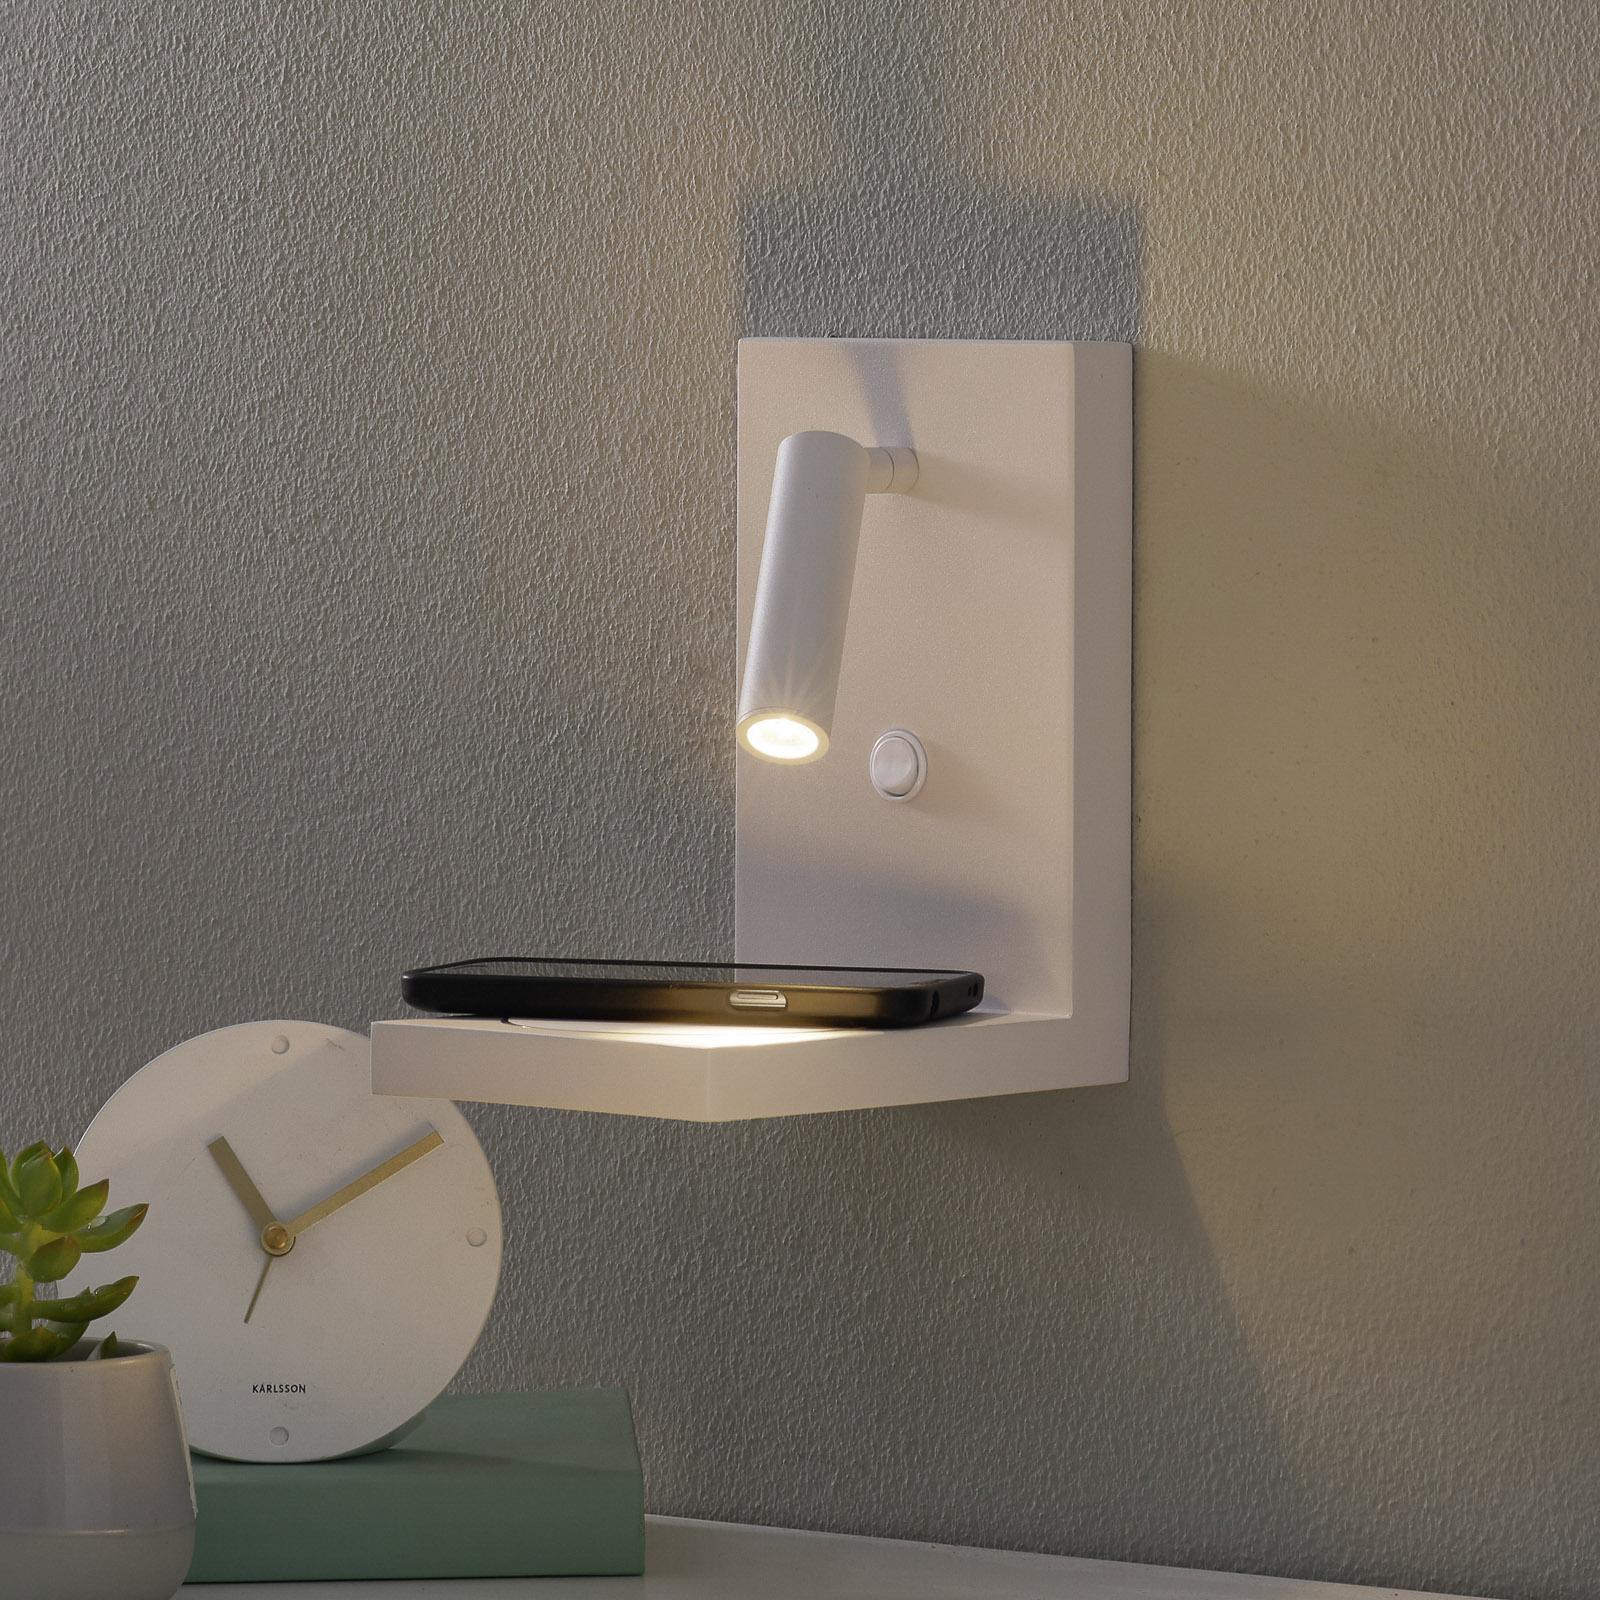 Applique LED Zanzibar avec liseuse, blanche